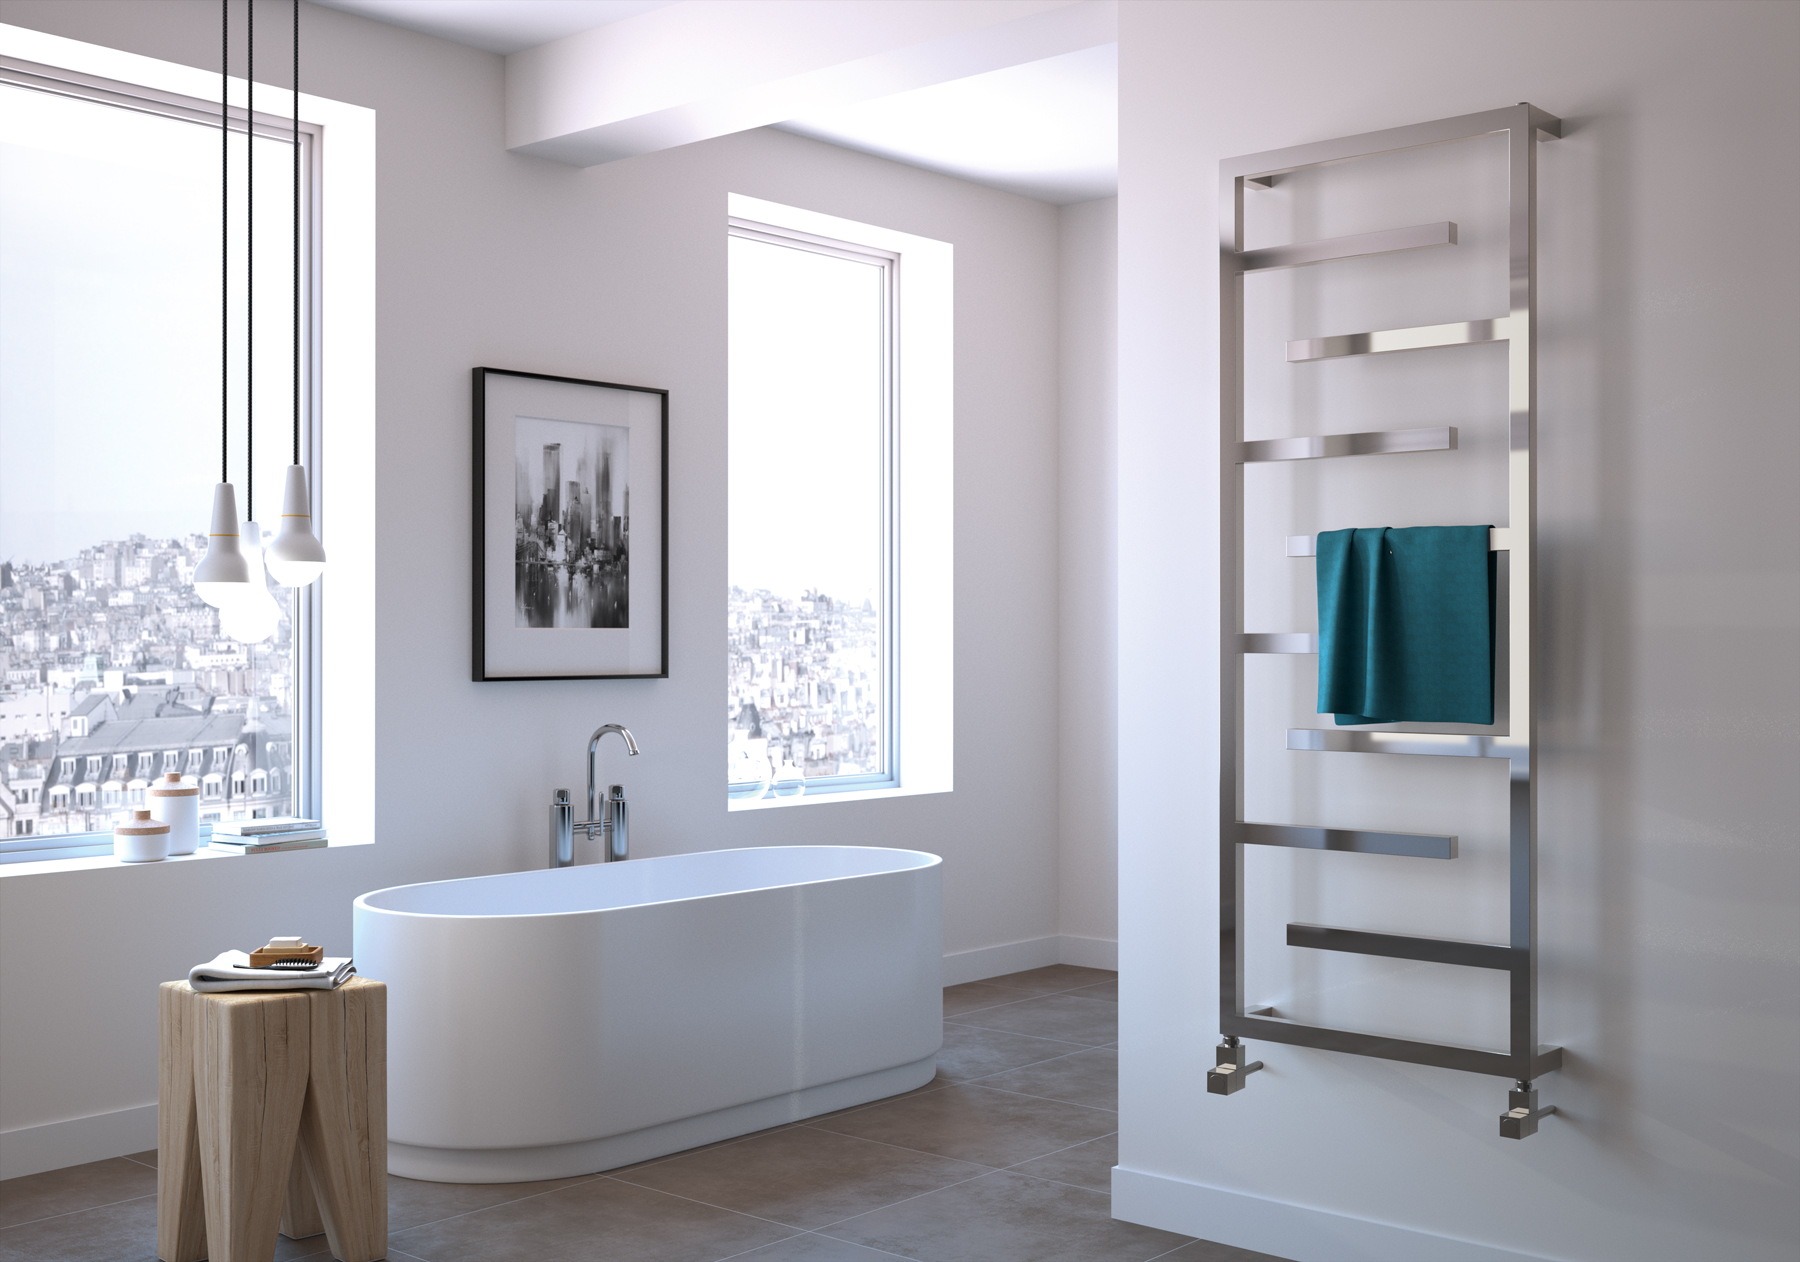 Radox Radiators, Exciting & Practical Solutions - Herts Bathrooms